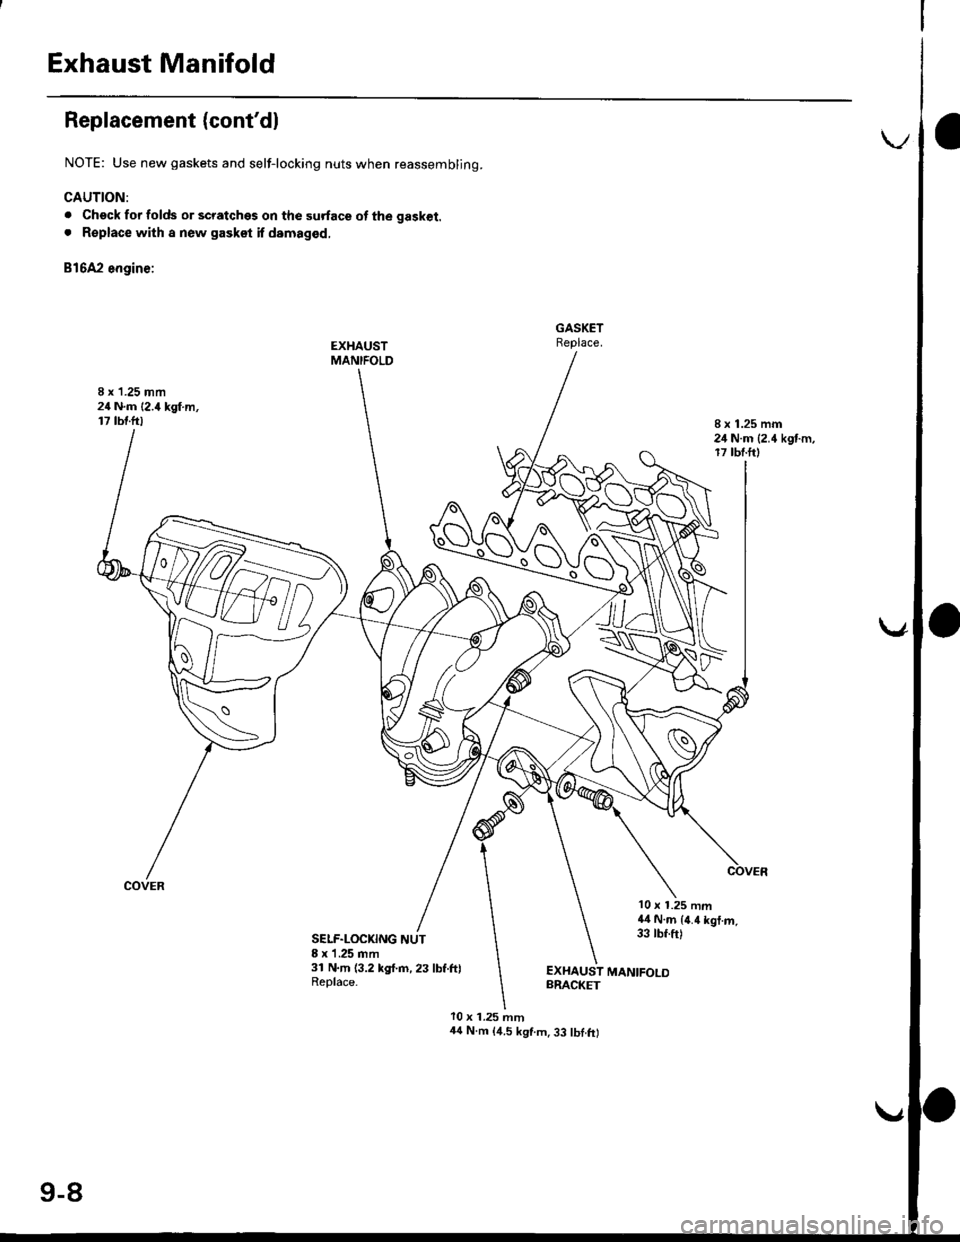 HONDA CIVIC 1997 6.G Workshop Manual, Page 249